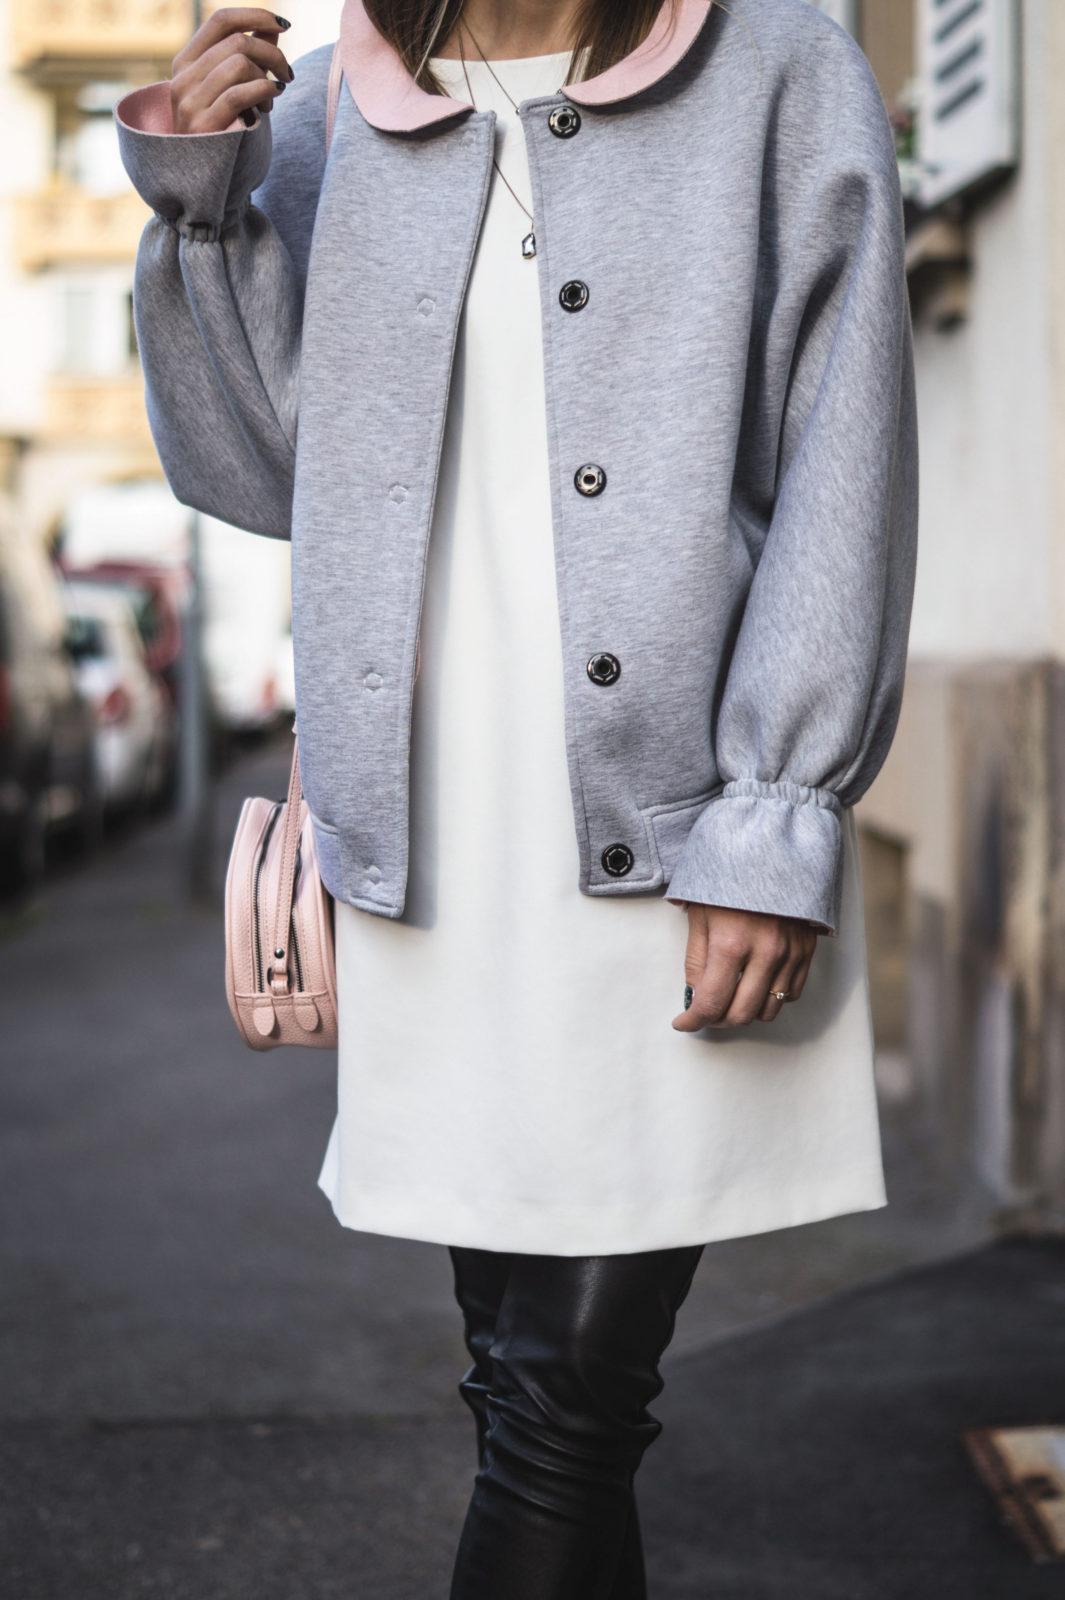 Gray-Bomber-Jacket-Bomberjacke-Grau-Rueschen-Rosa-Modeblog-Heidelberg-Fashionblogger-Details-Liebesglueck